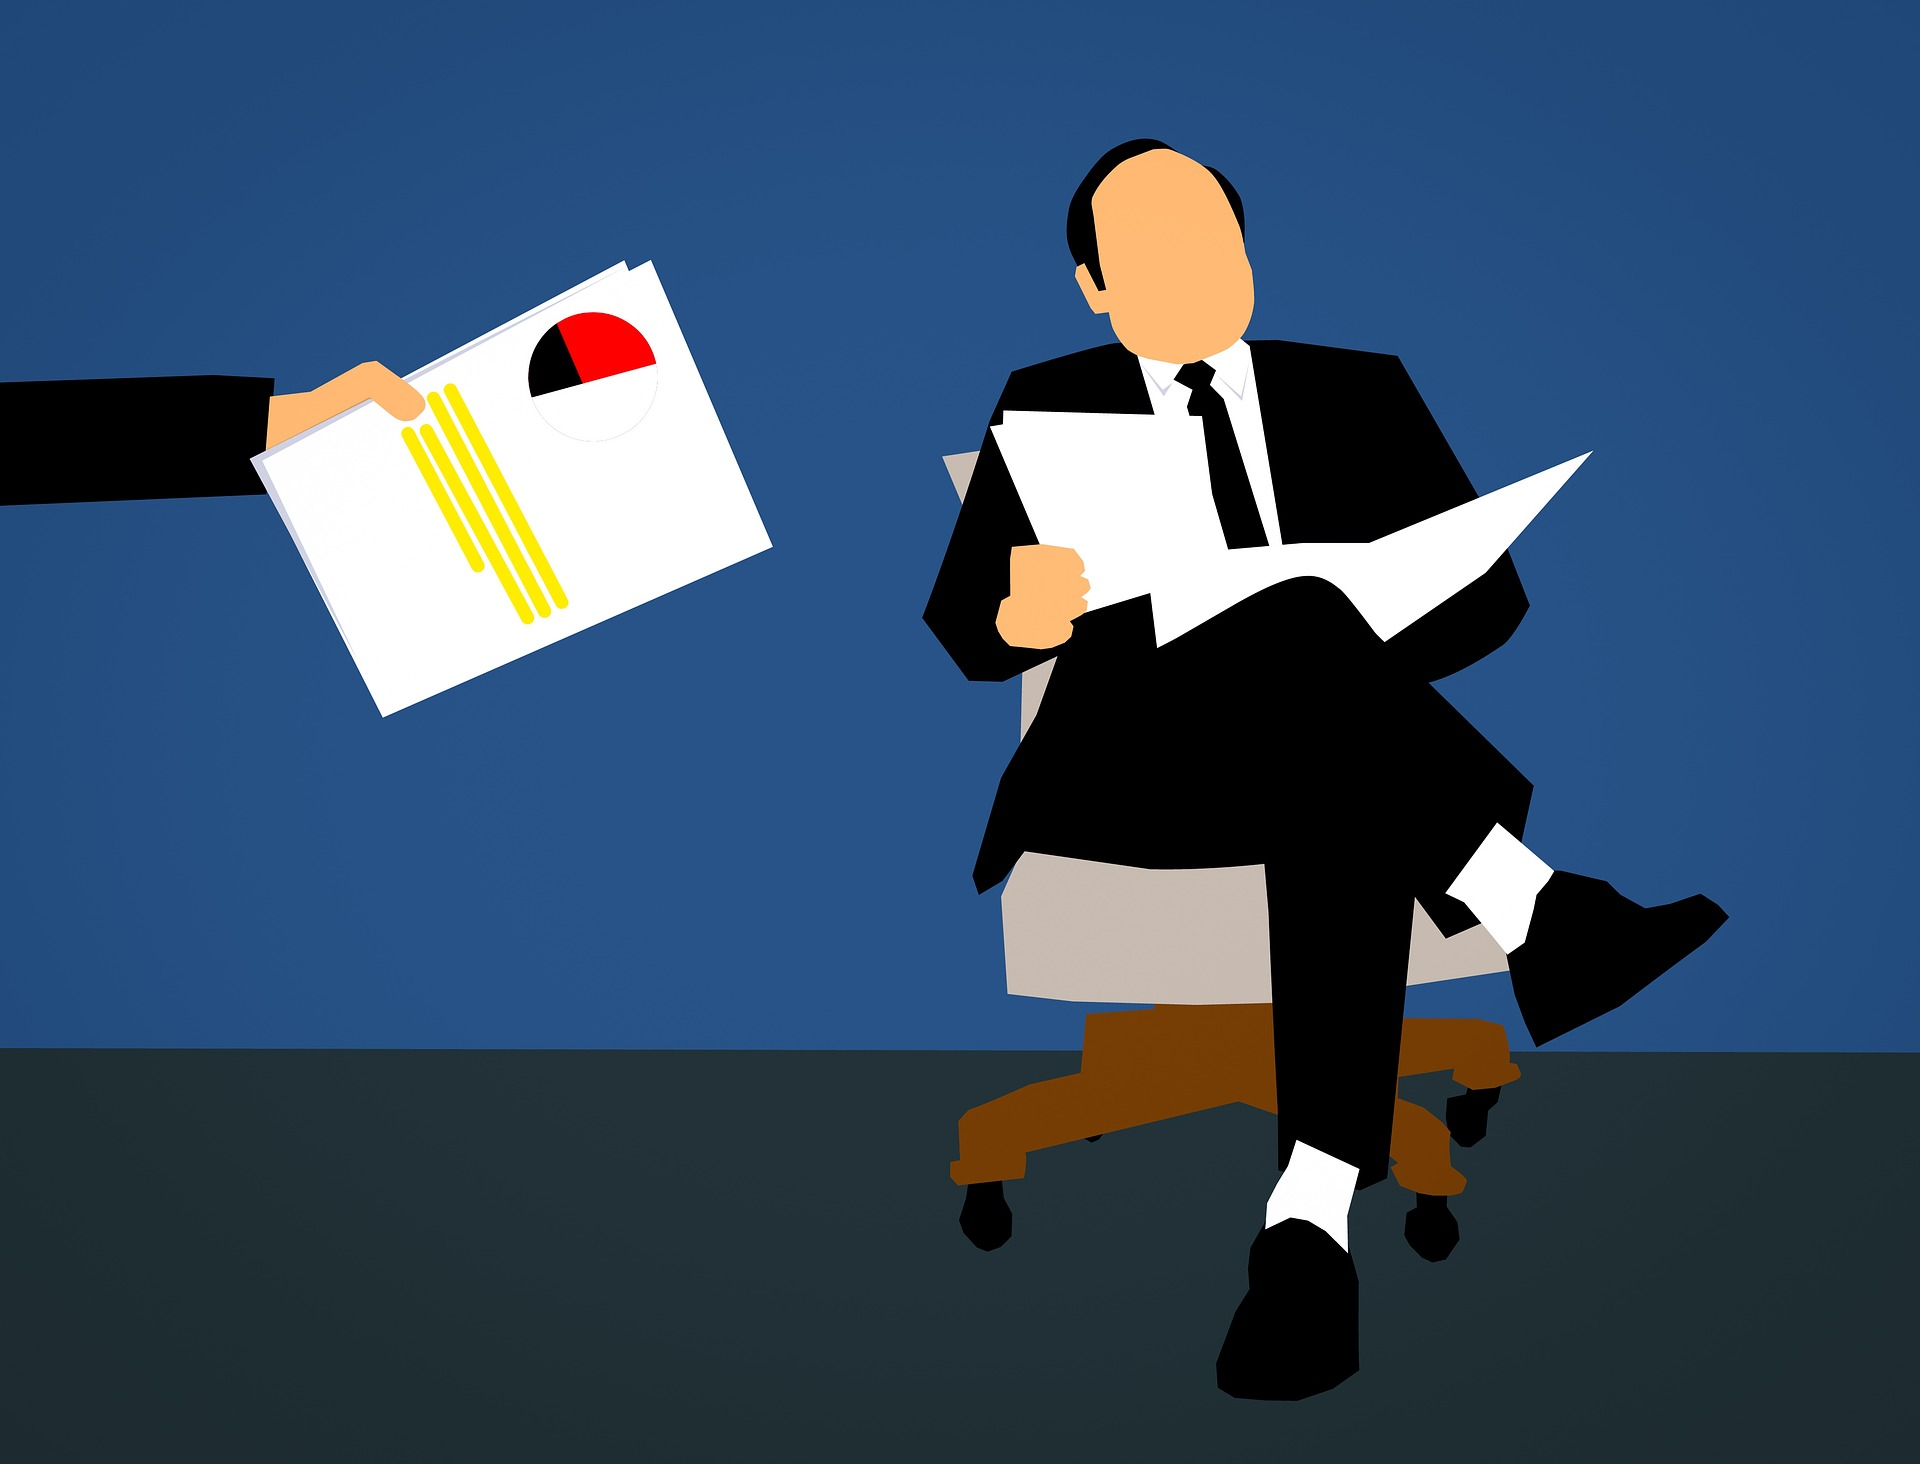 ocena kredytowa wpływa na randki